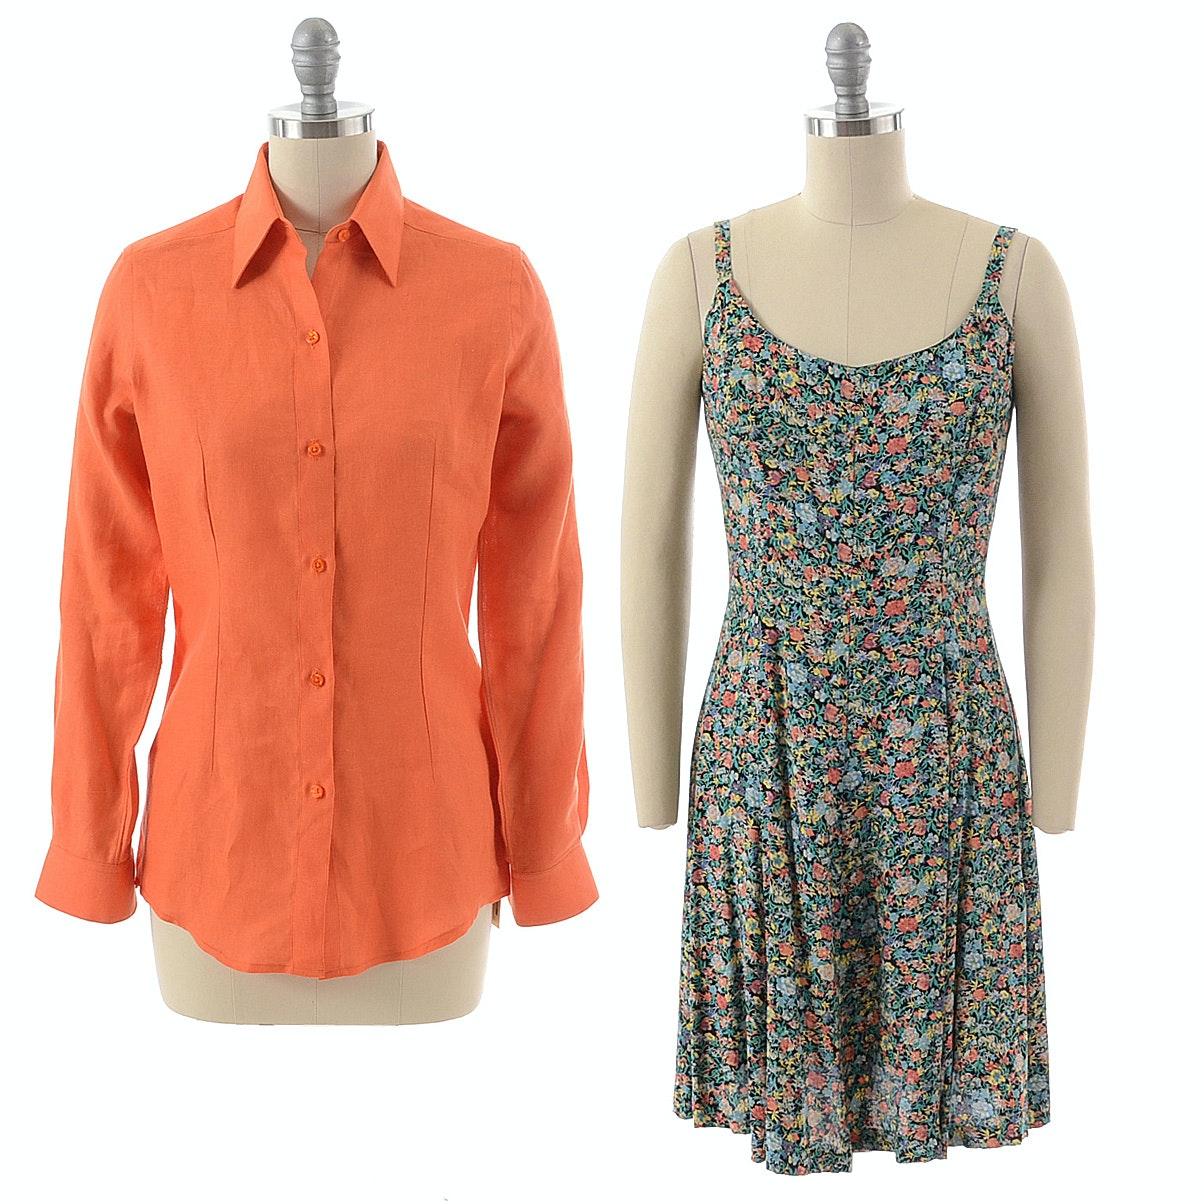 Steven Stolman Shirt and Elizabeth Wayman Dress